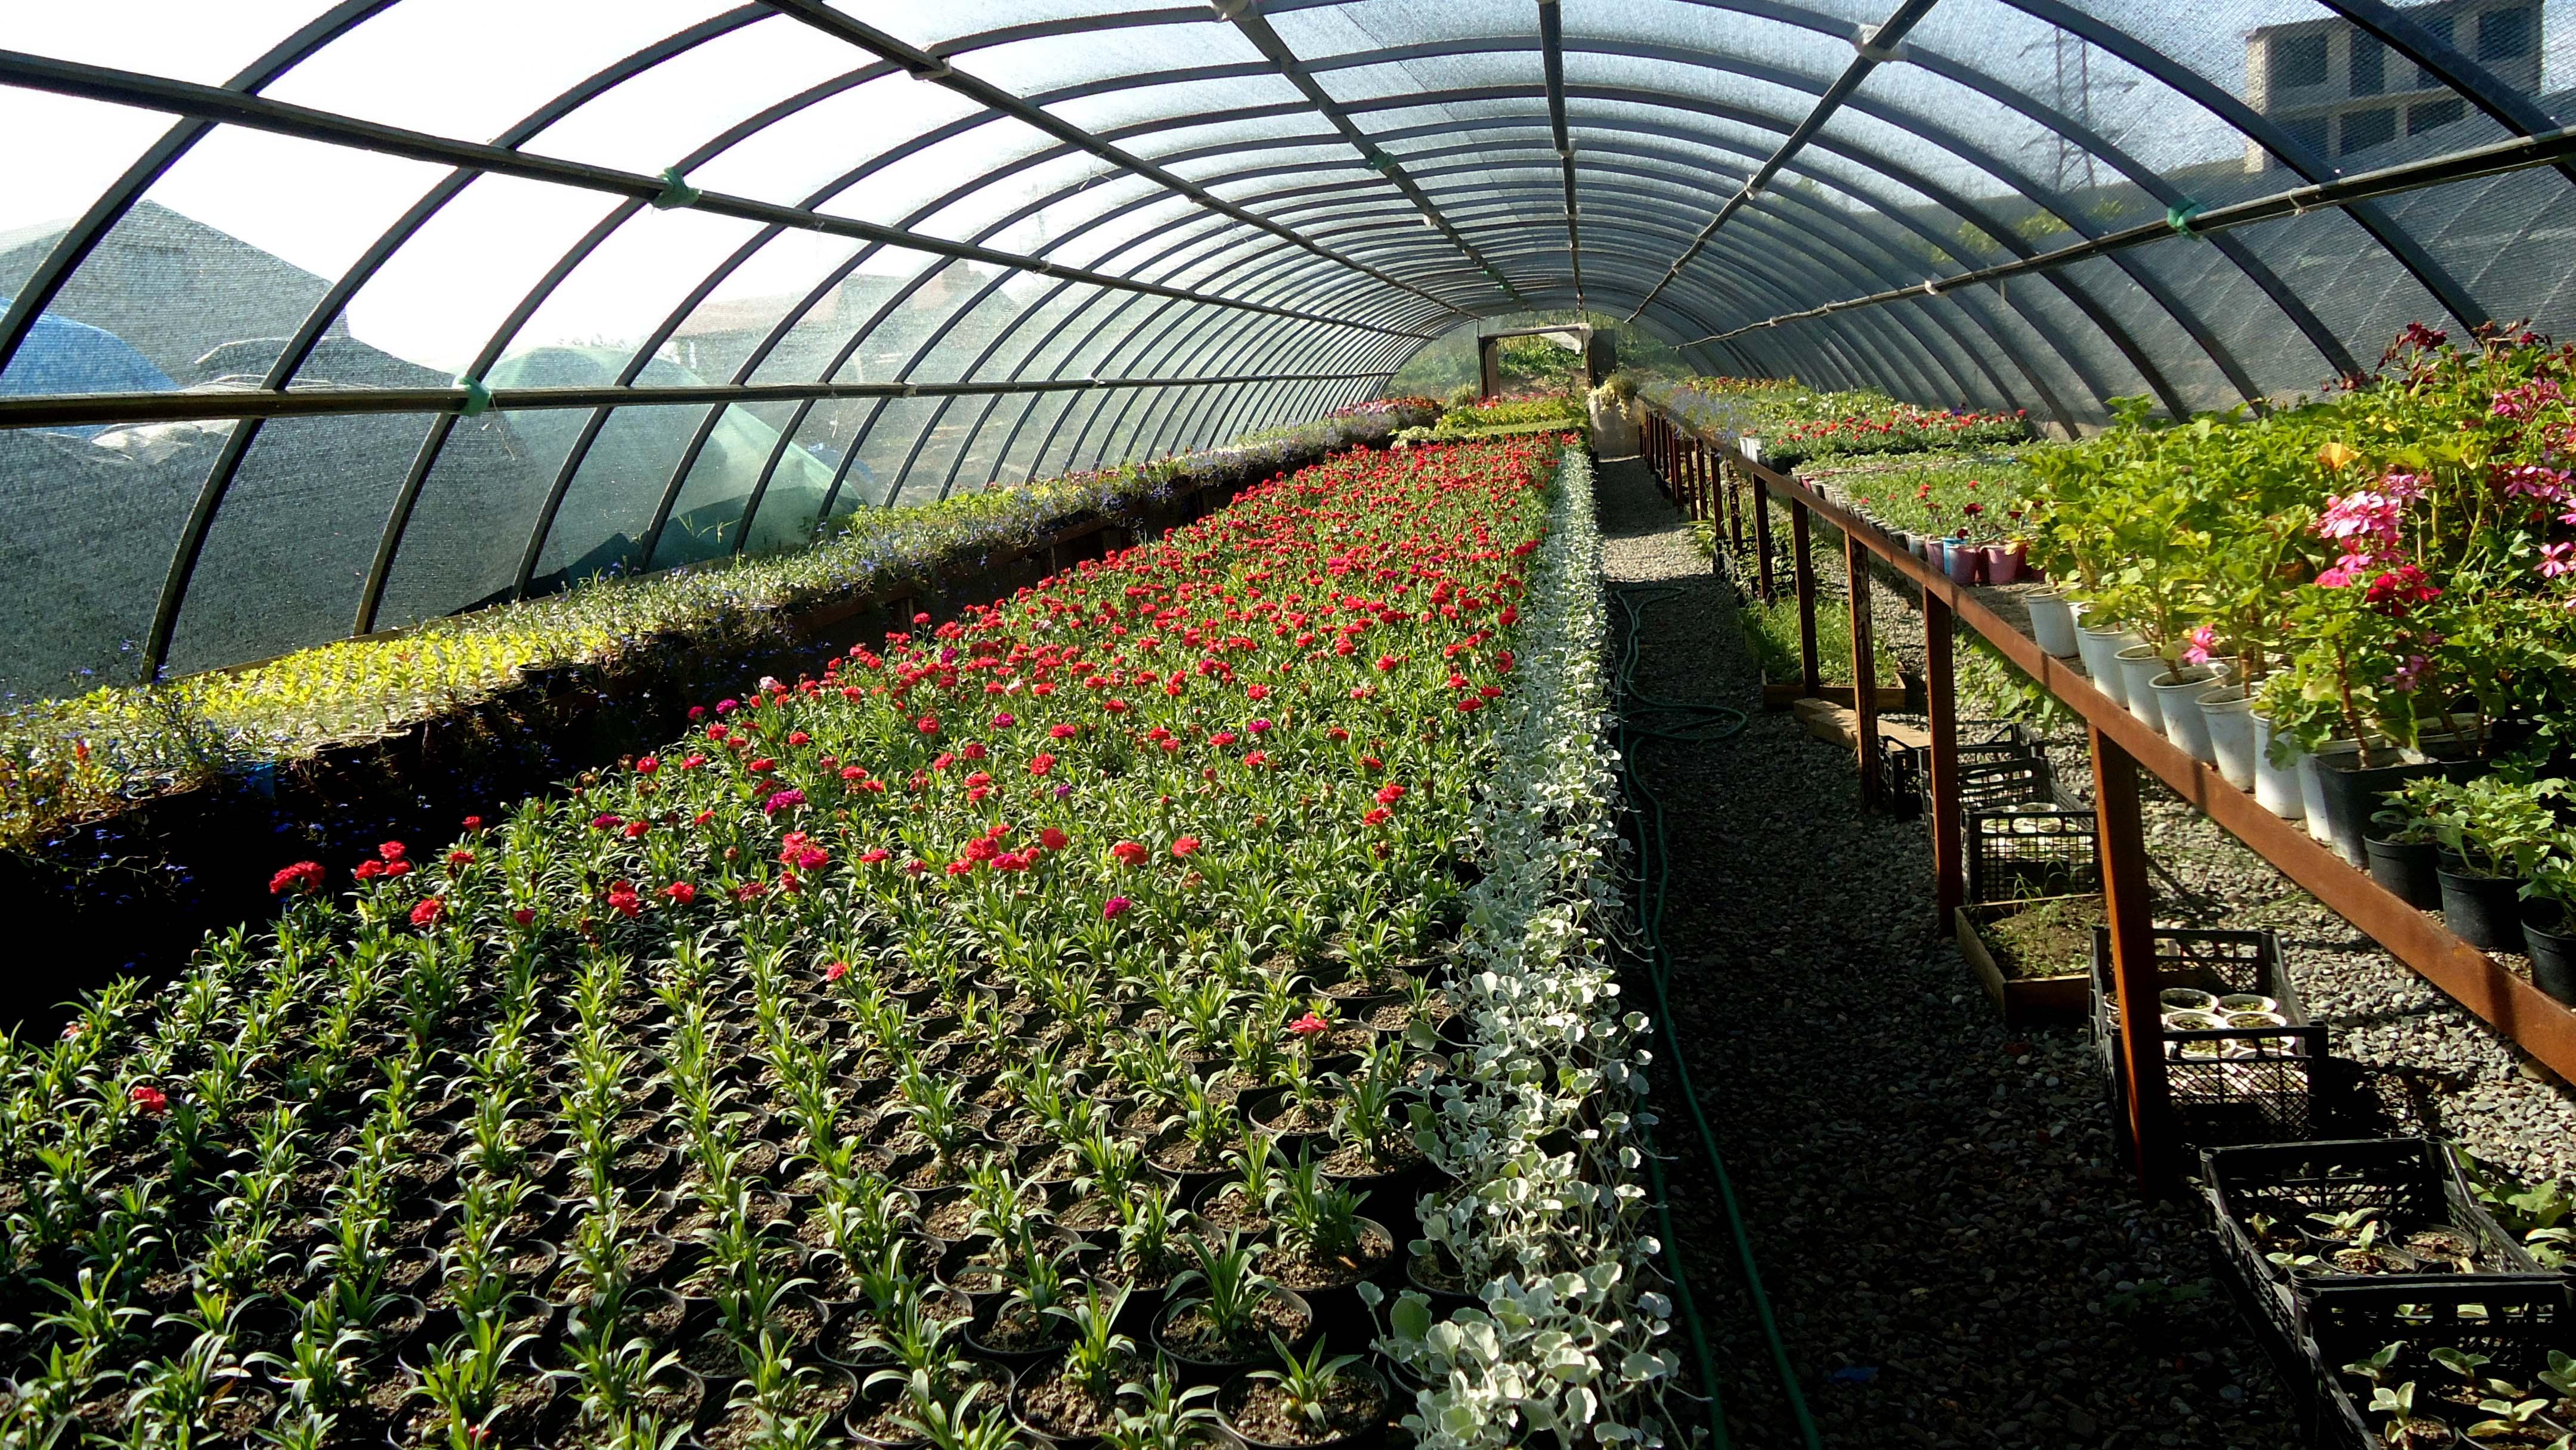 shevardnadze gardenia